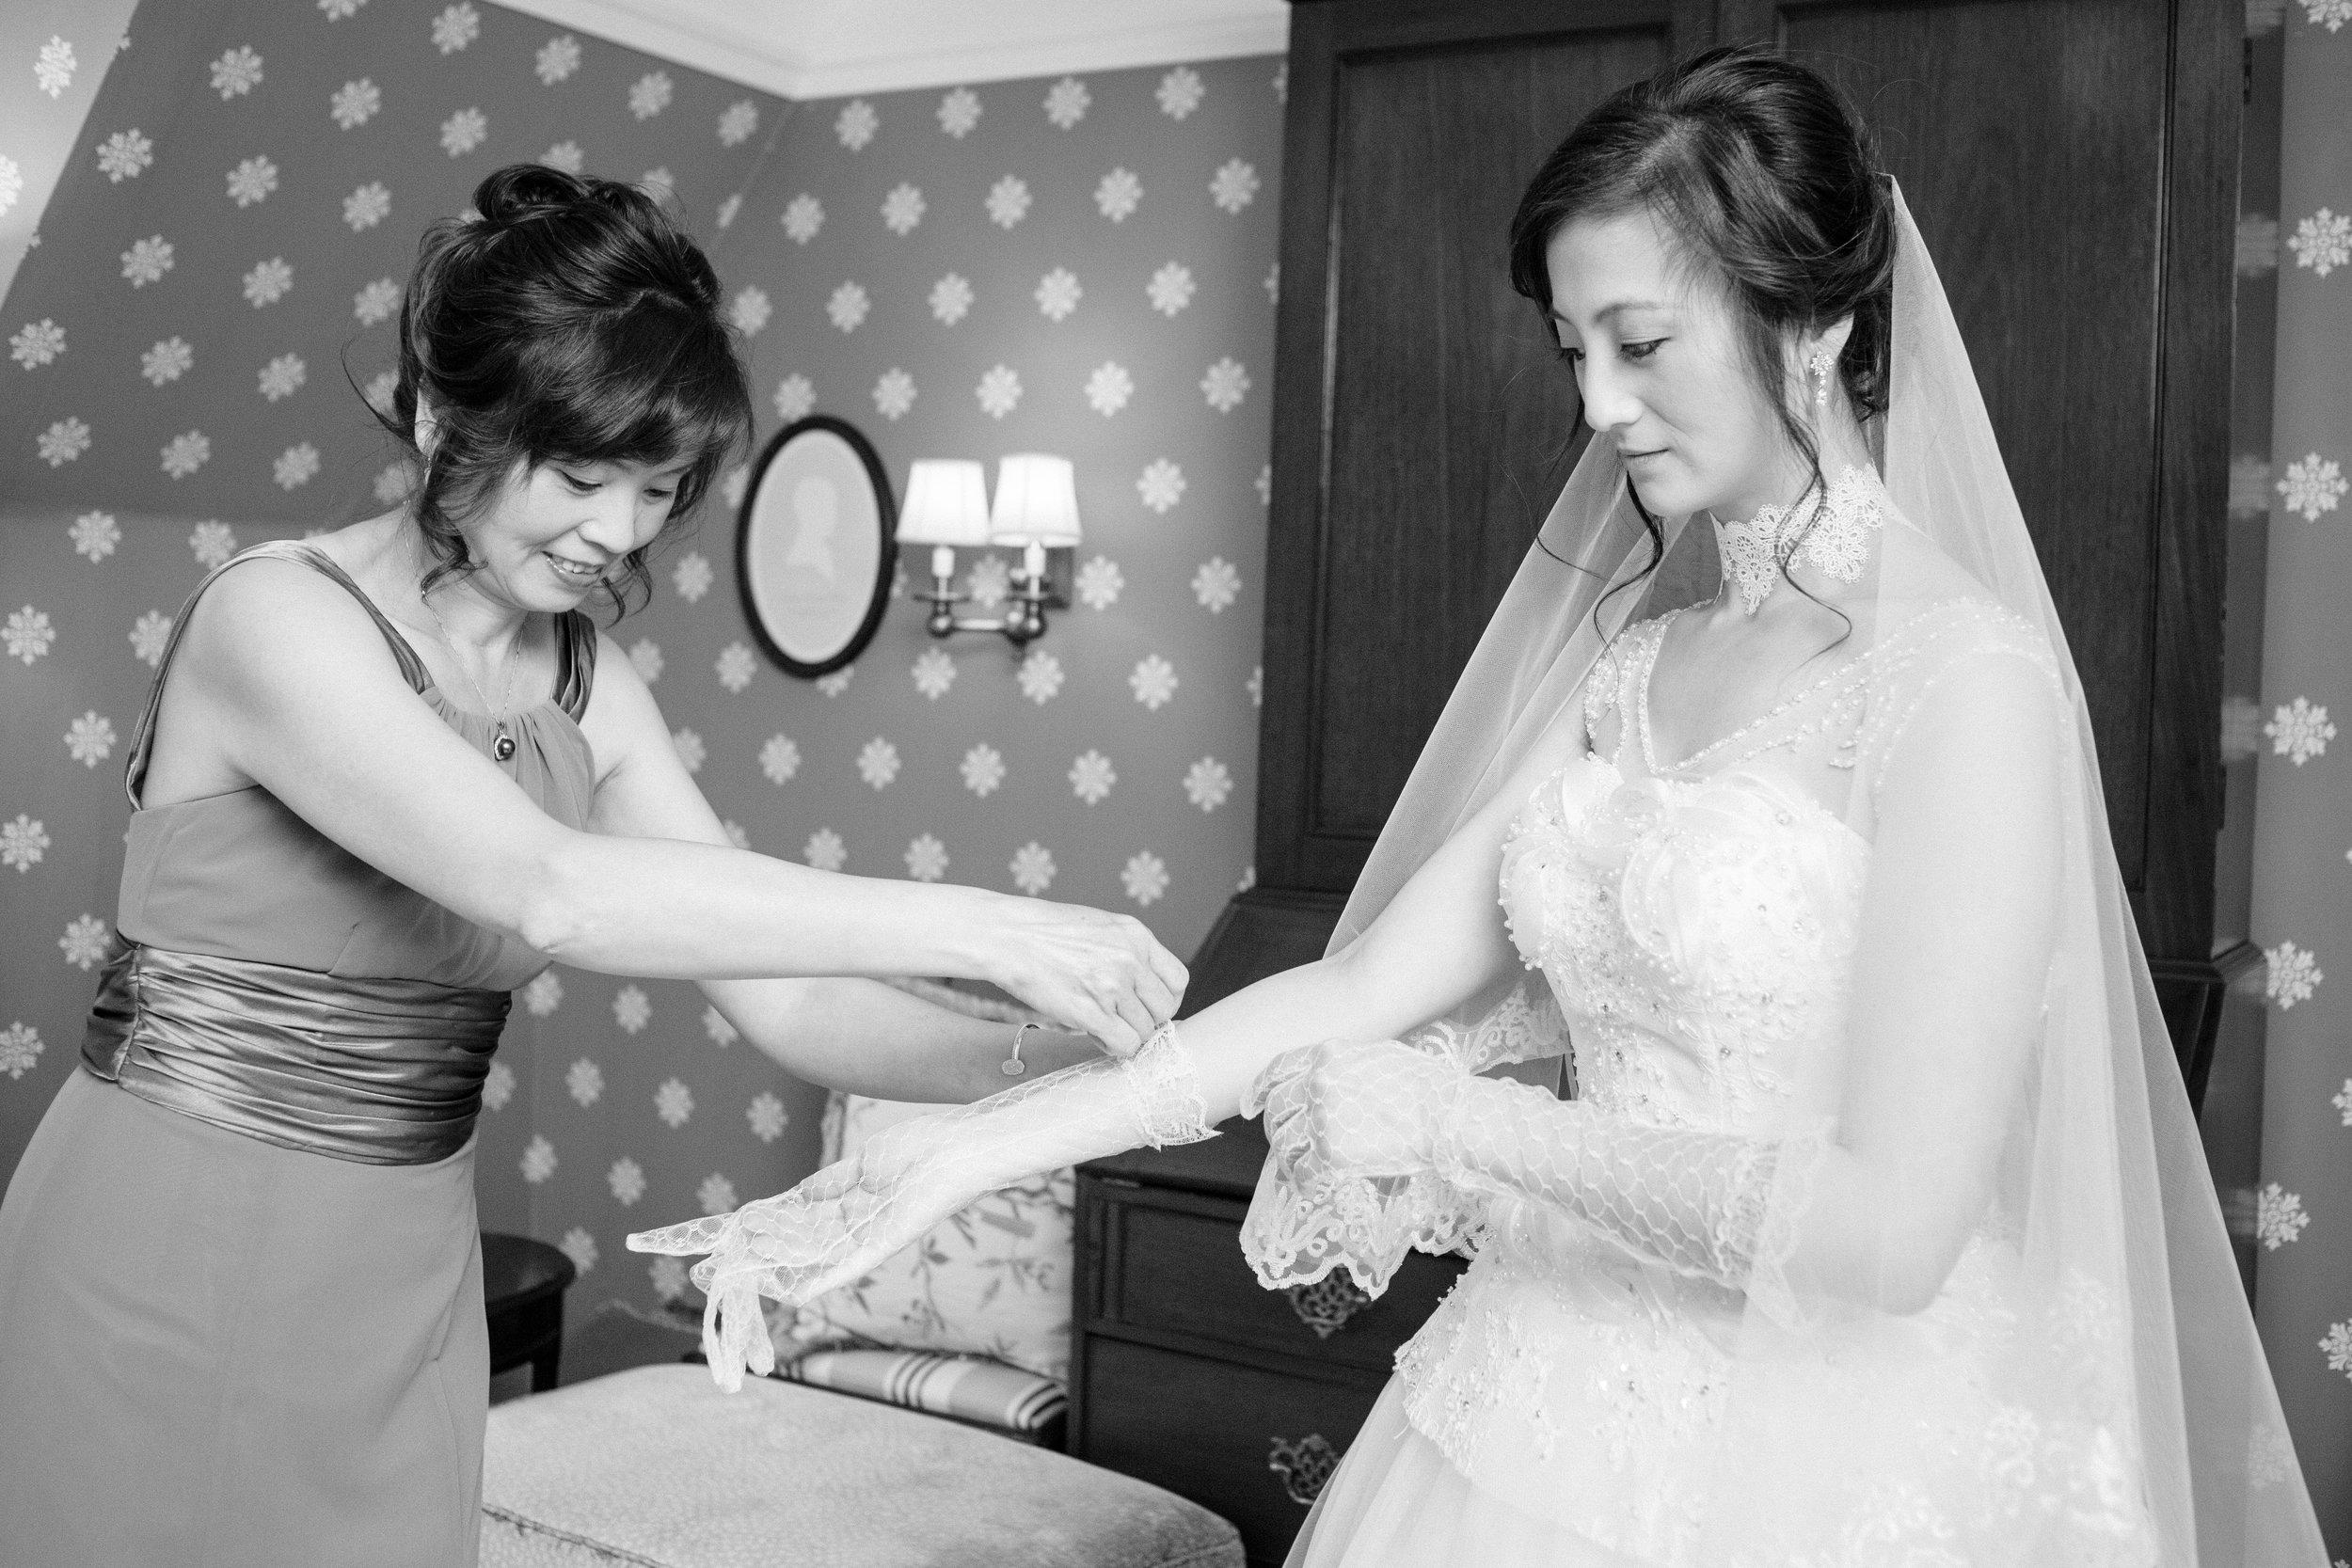 2017_04_30_jenny_jonathans_wedding_getting_ready-107.jpg